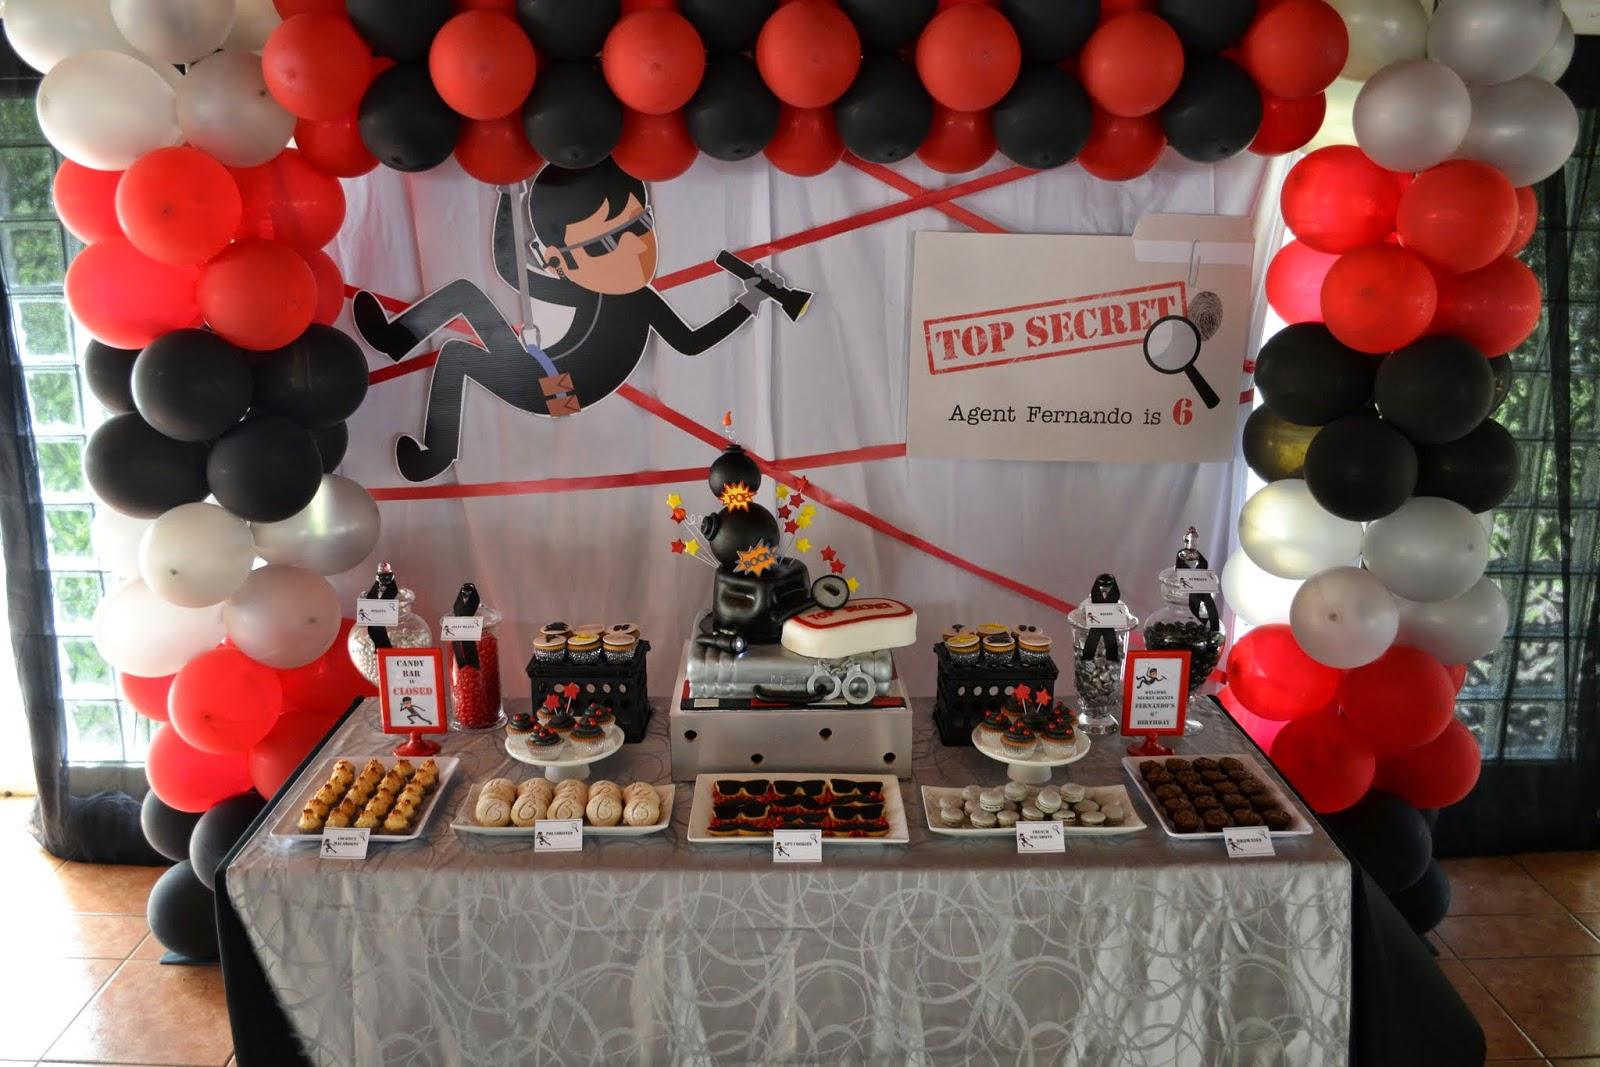 Secret Agent Cake Decorations